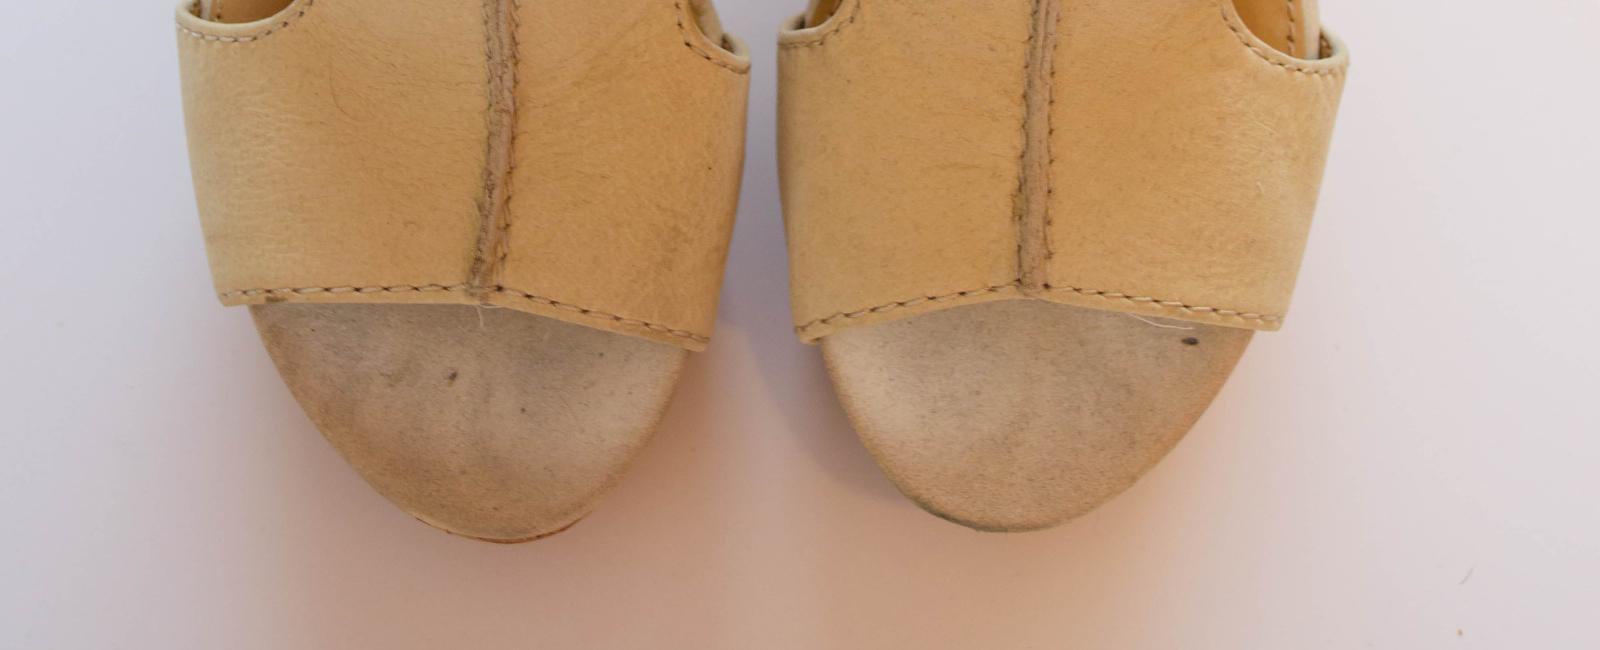 Foot Care Basics